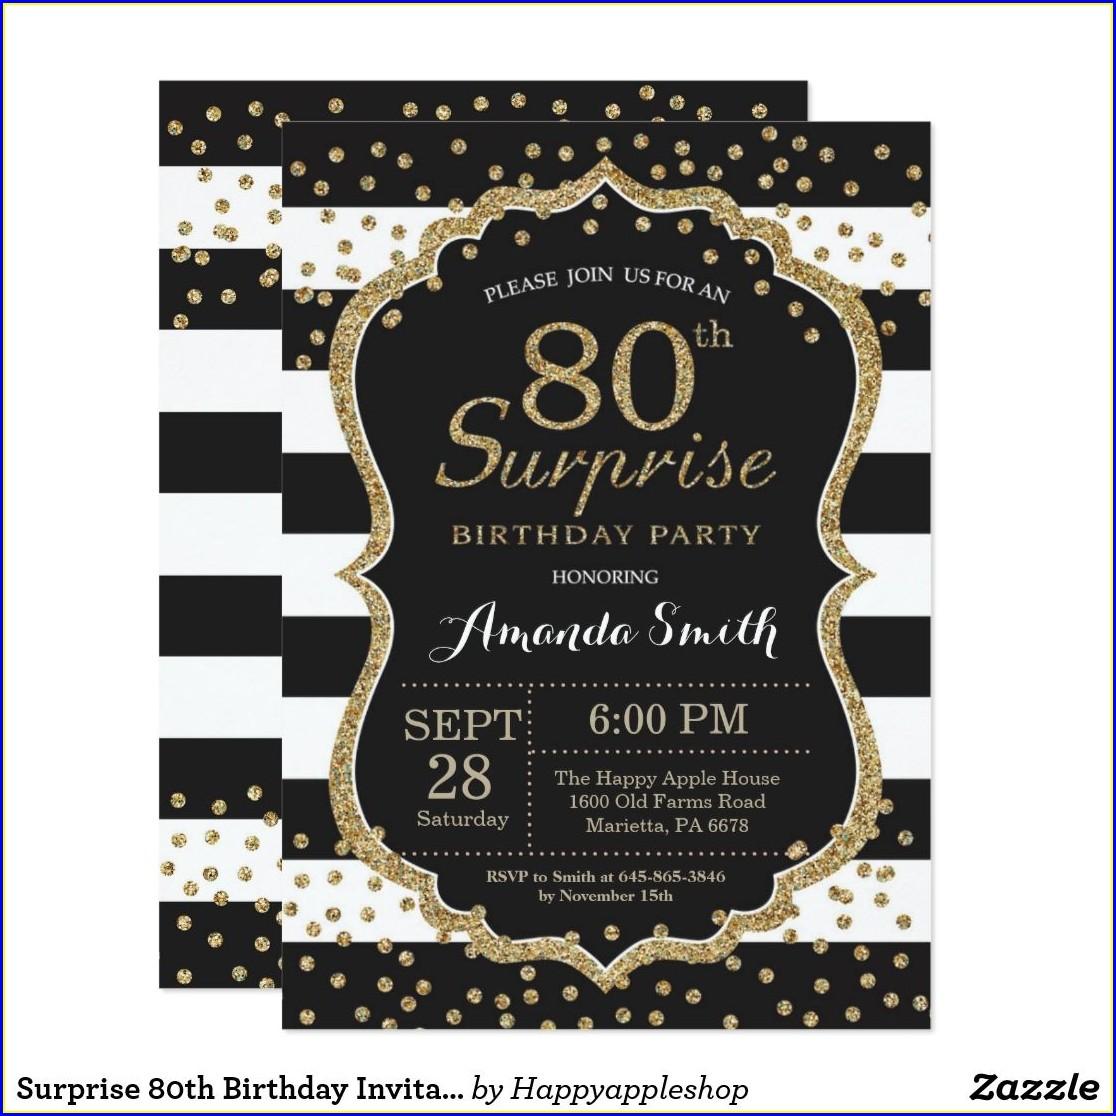 Surprise 80th Birthday Invitations